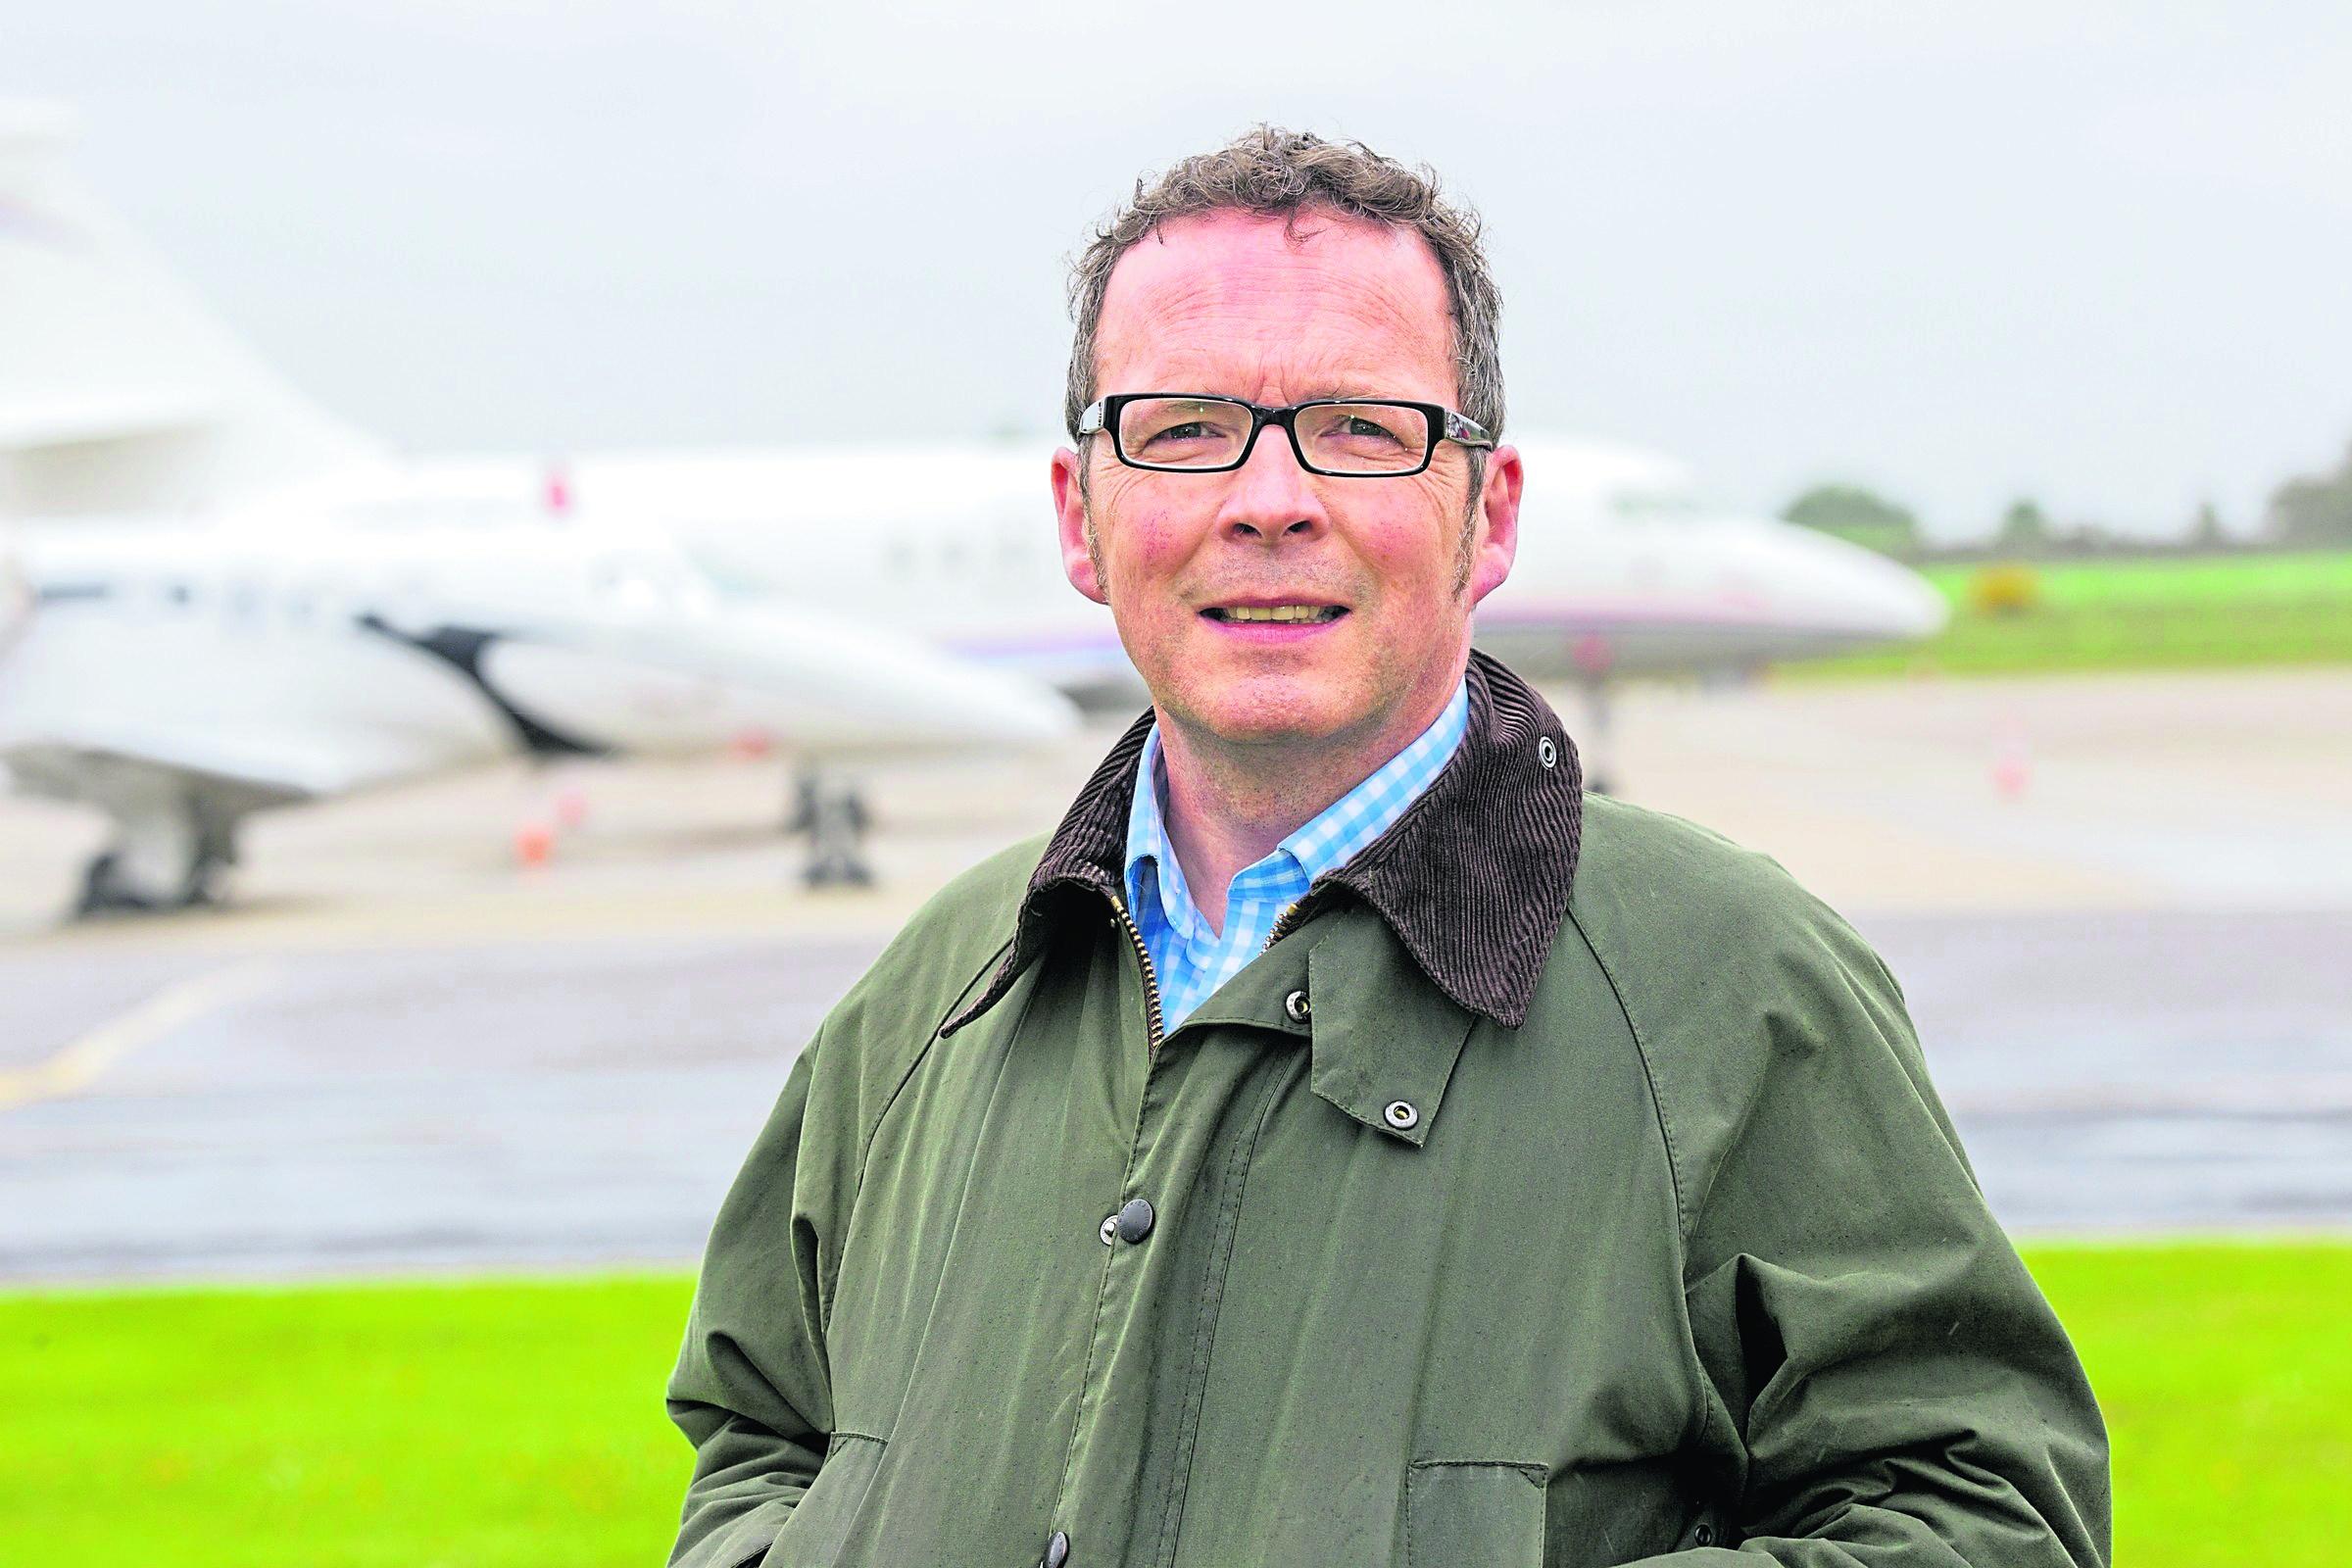 Highlands and Islands Airports Ltd managing director Inglis Lyon